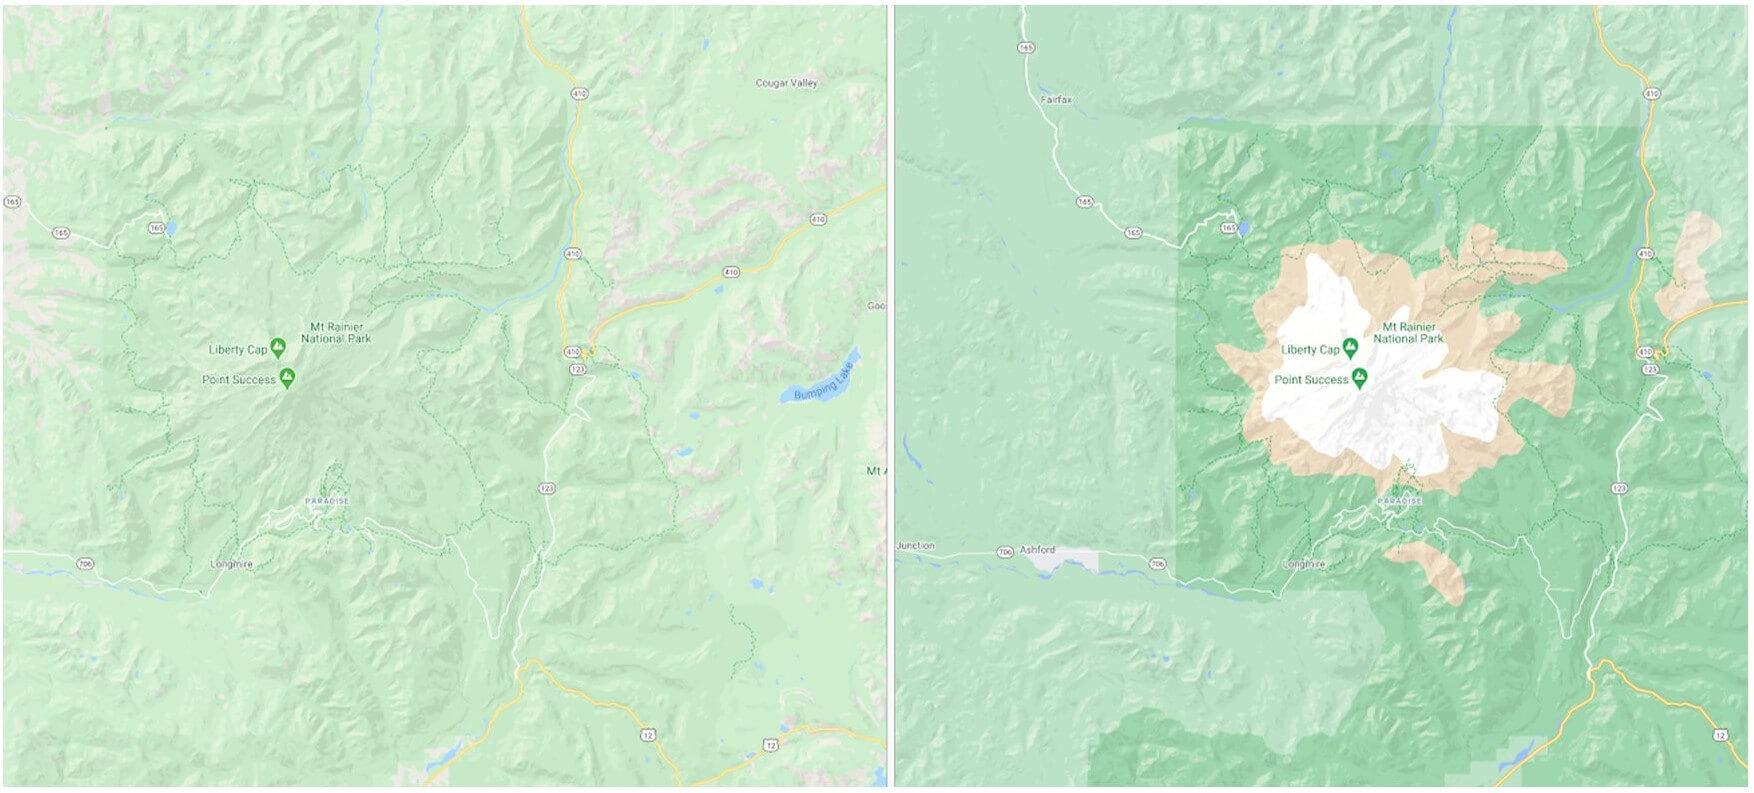 mapy google 1 1